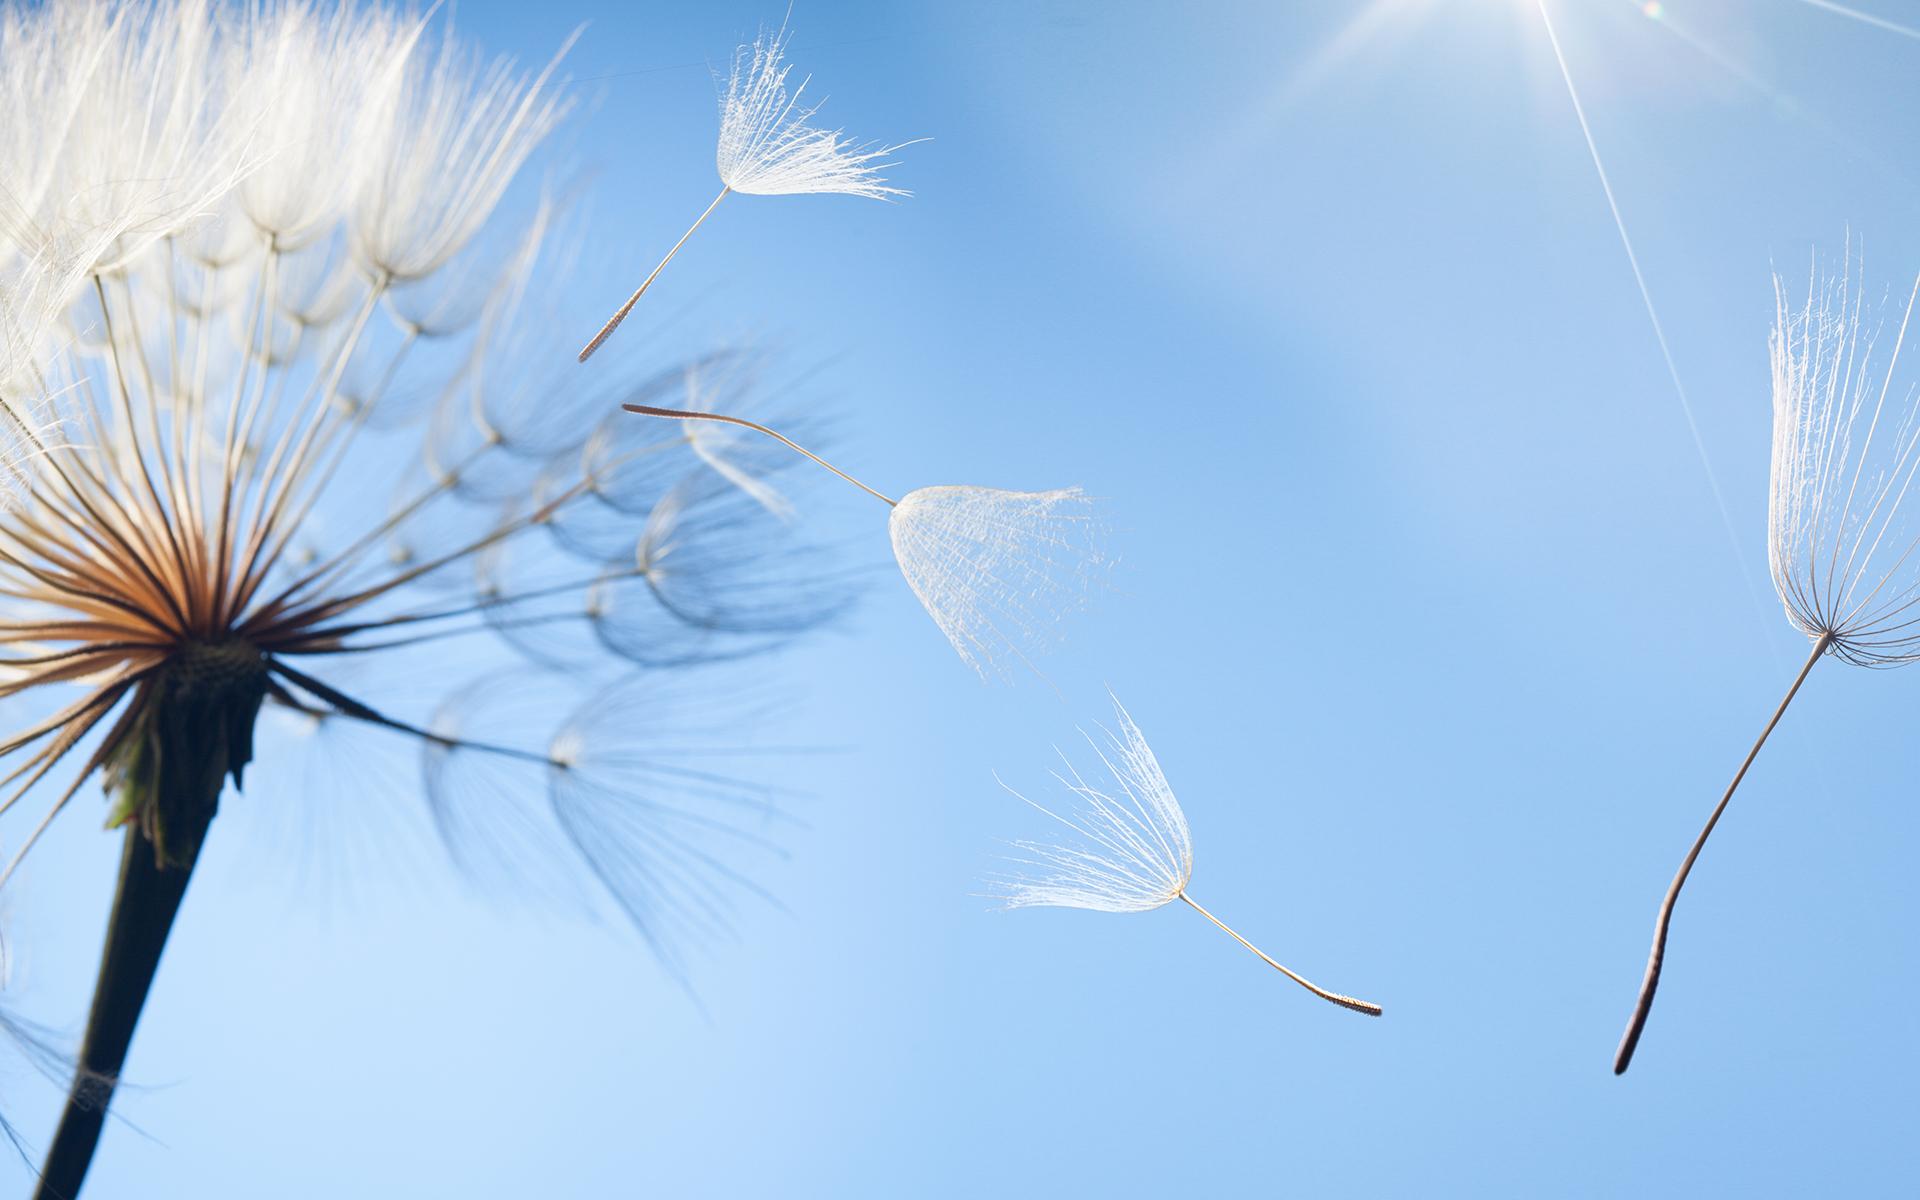 A Guided Meditation for Kids - flying dandelion seeds on a blue background